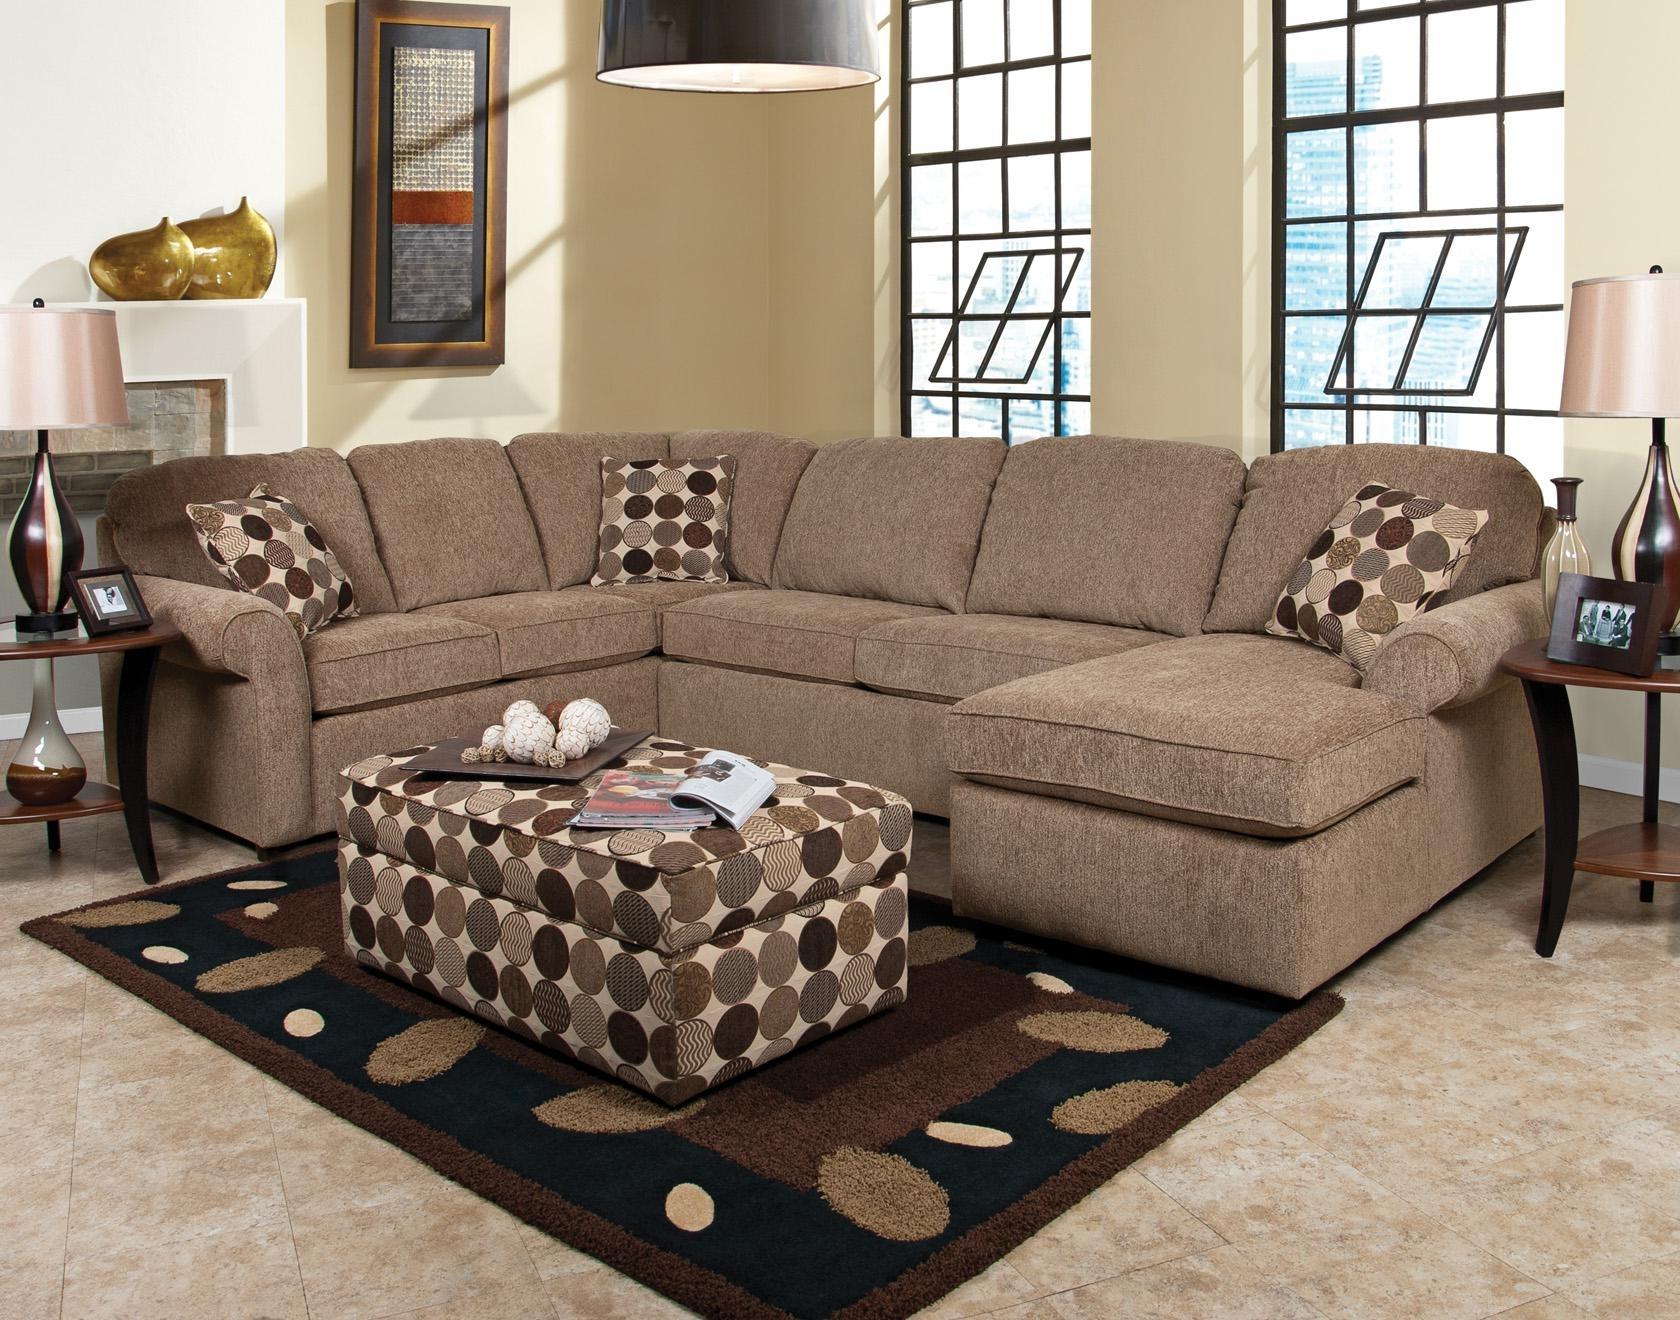 England Malibu 4 5 Seat Corner Sectional Sofa (Gallery 5 of 15)